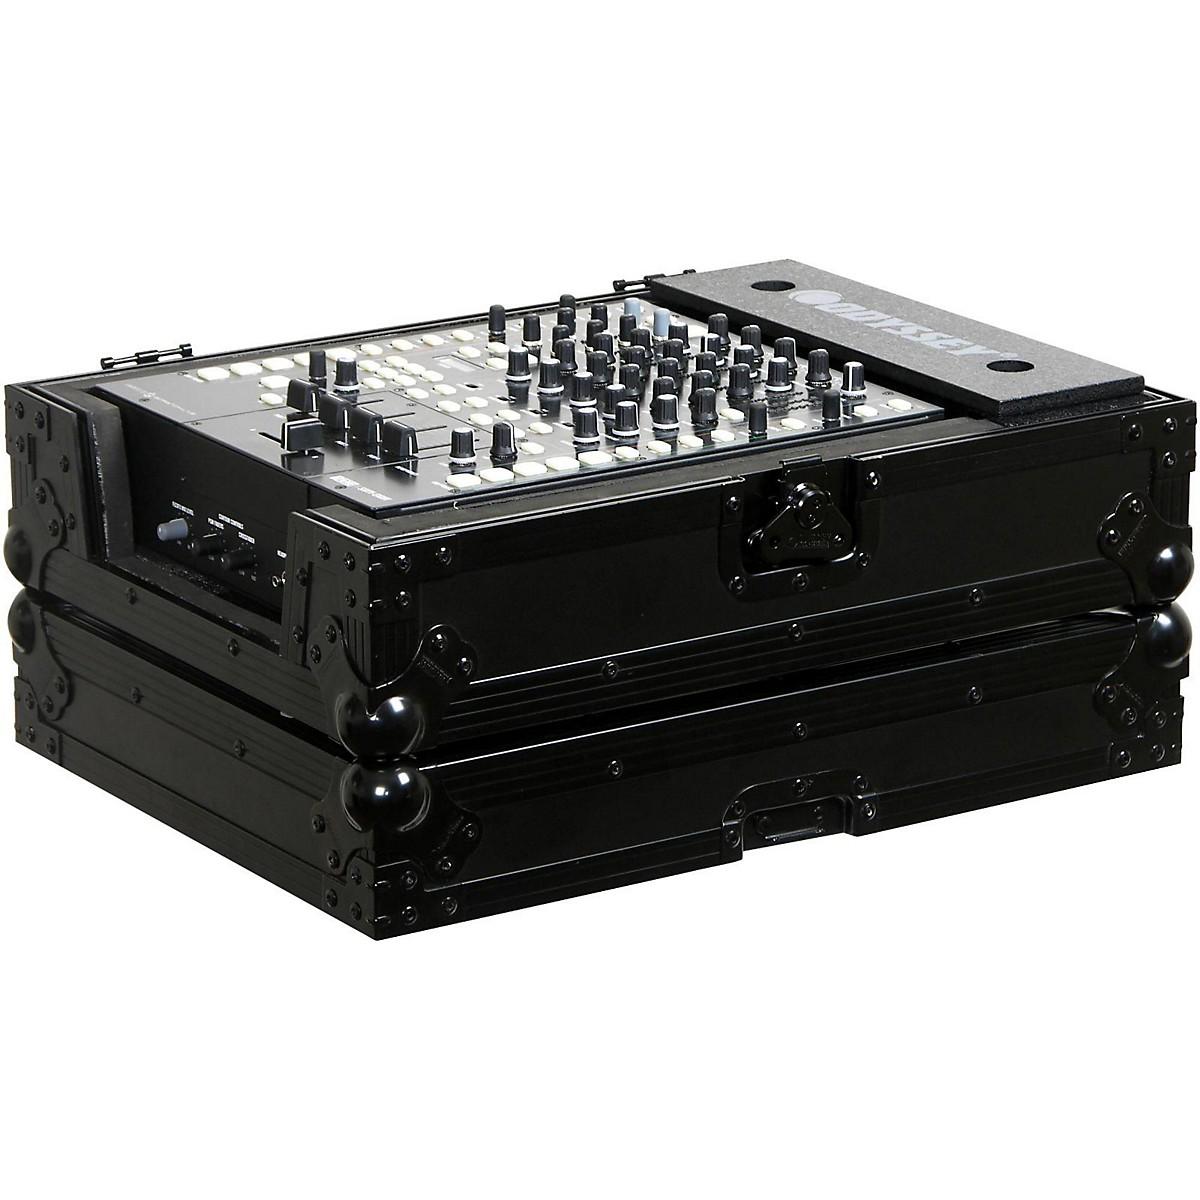 Odyssey ATA Black Label Coffin for DJ Mixers